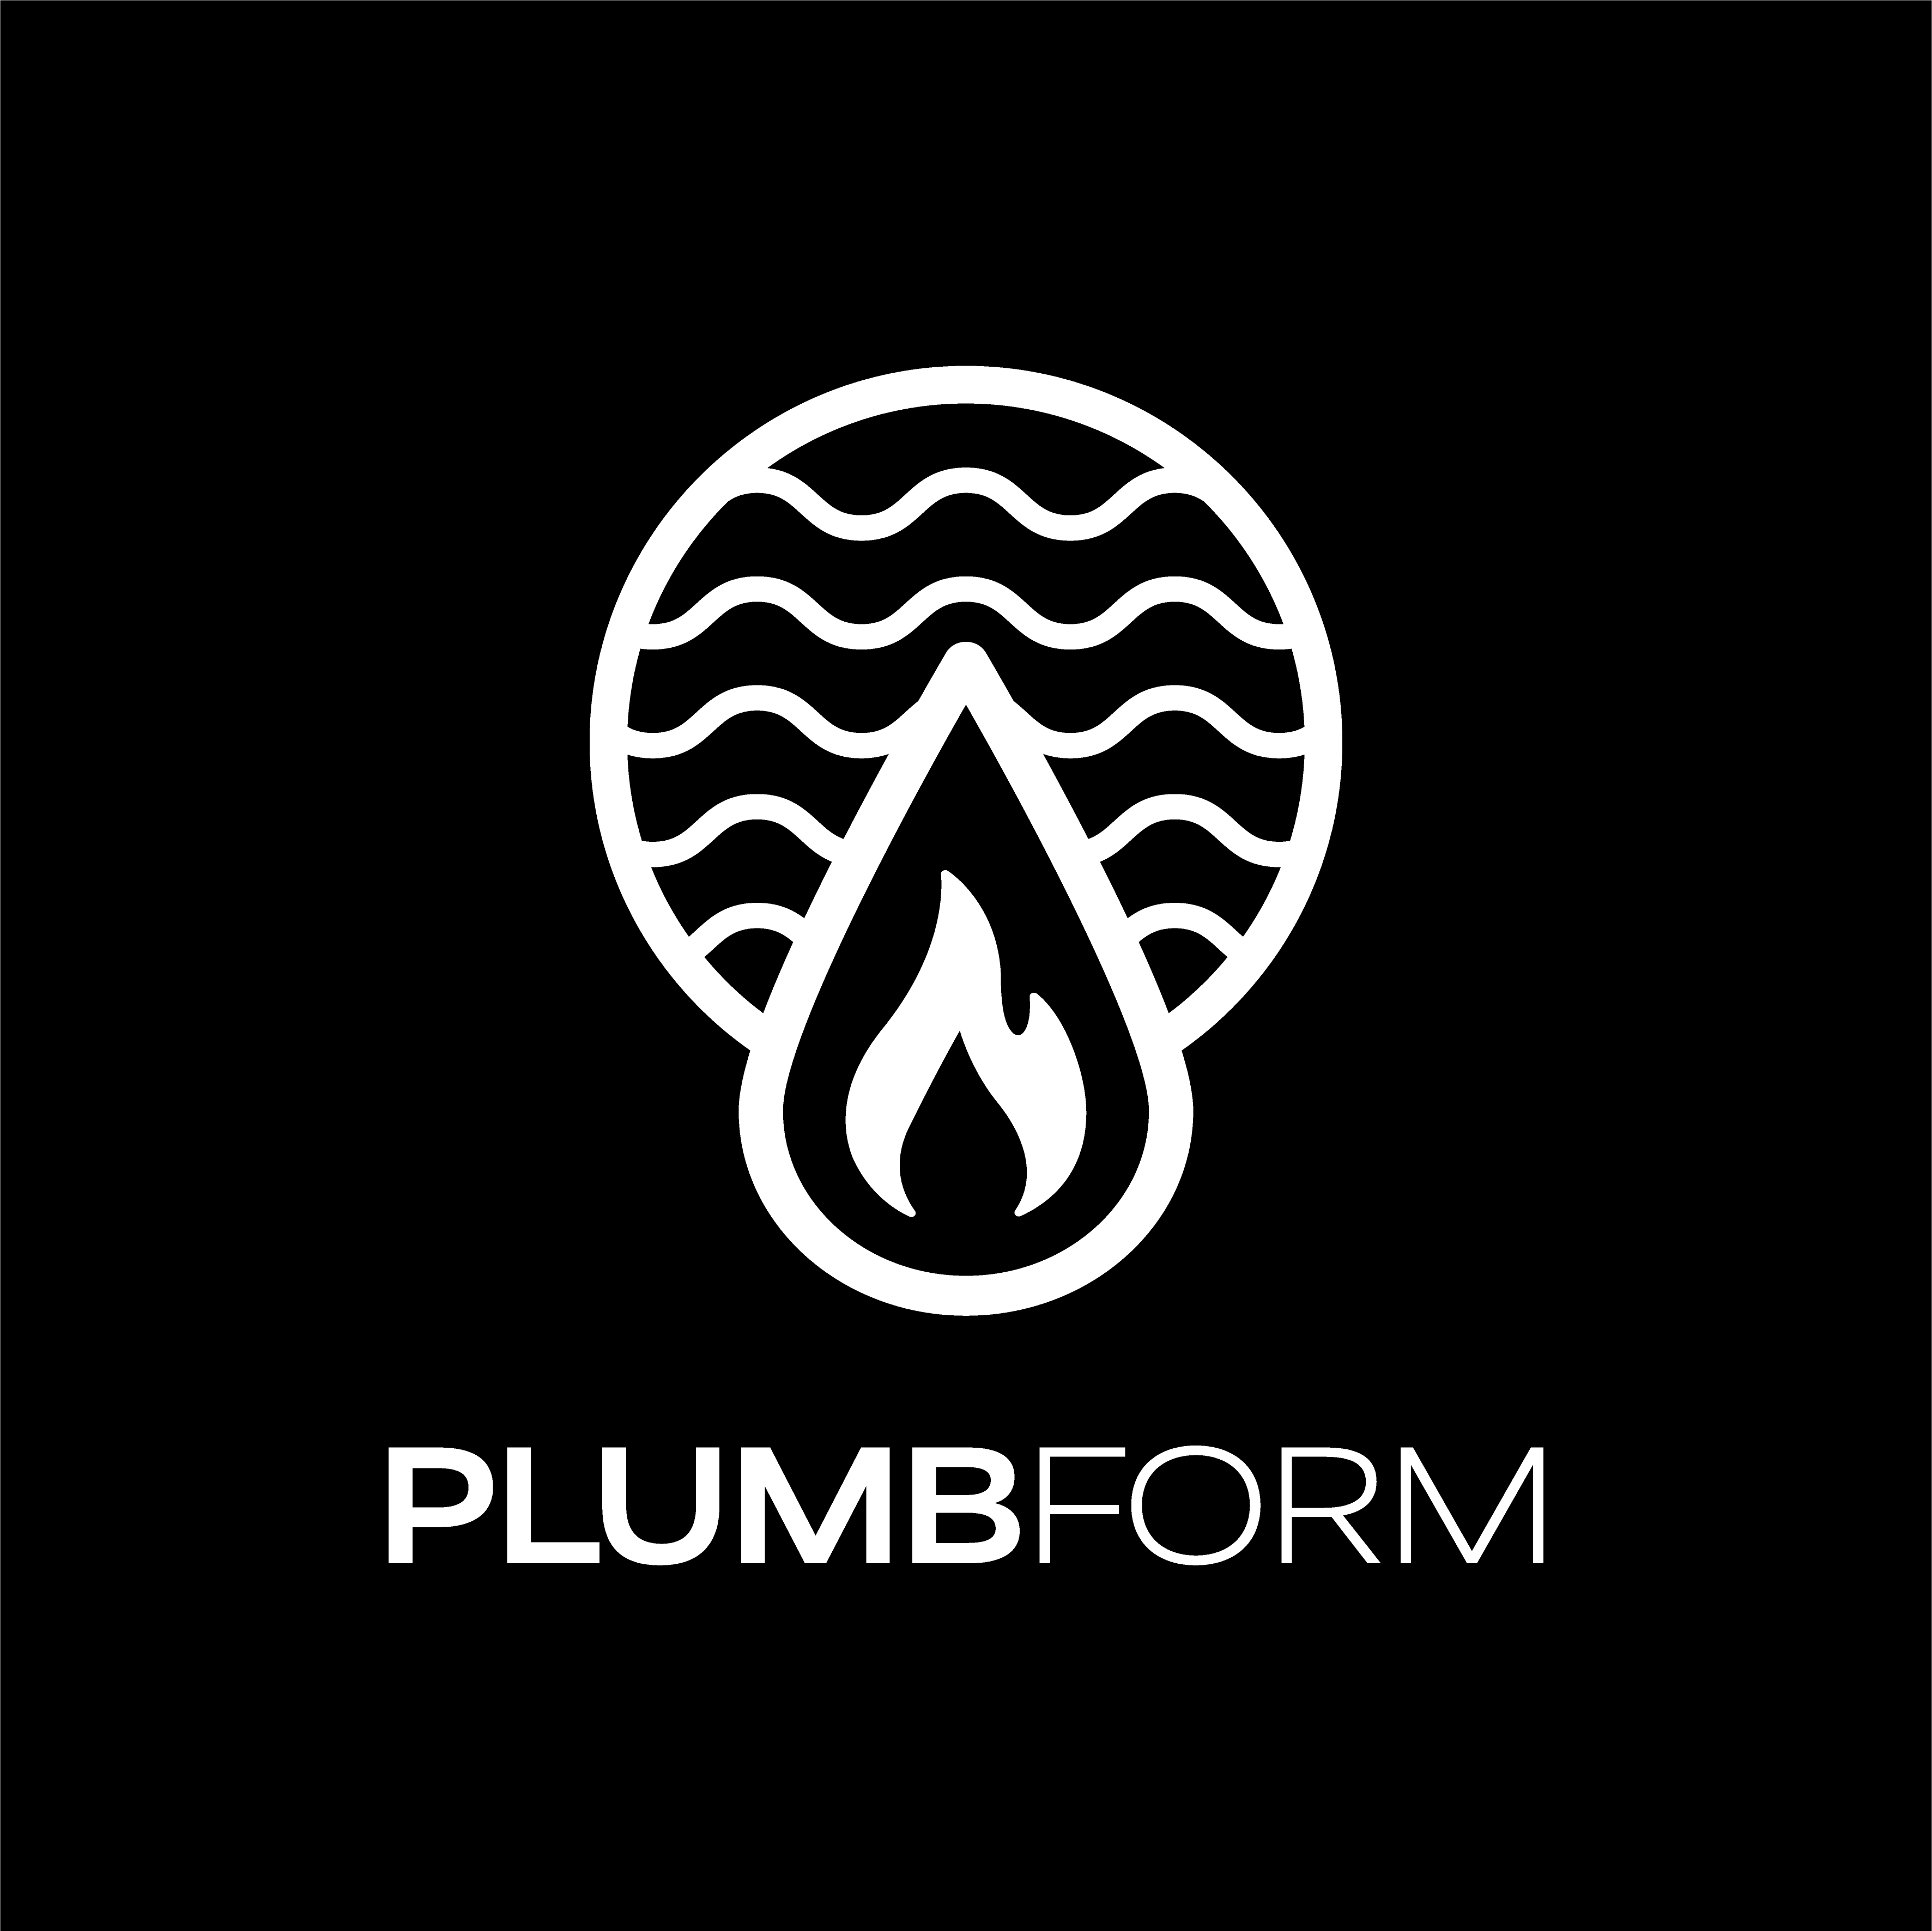 Modern Professional Logo Design For Plumbform By Ryan Orlowski Design 23408902